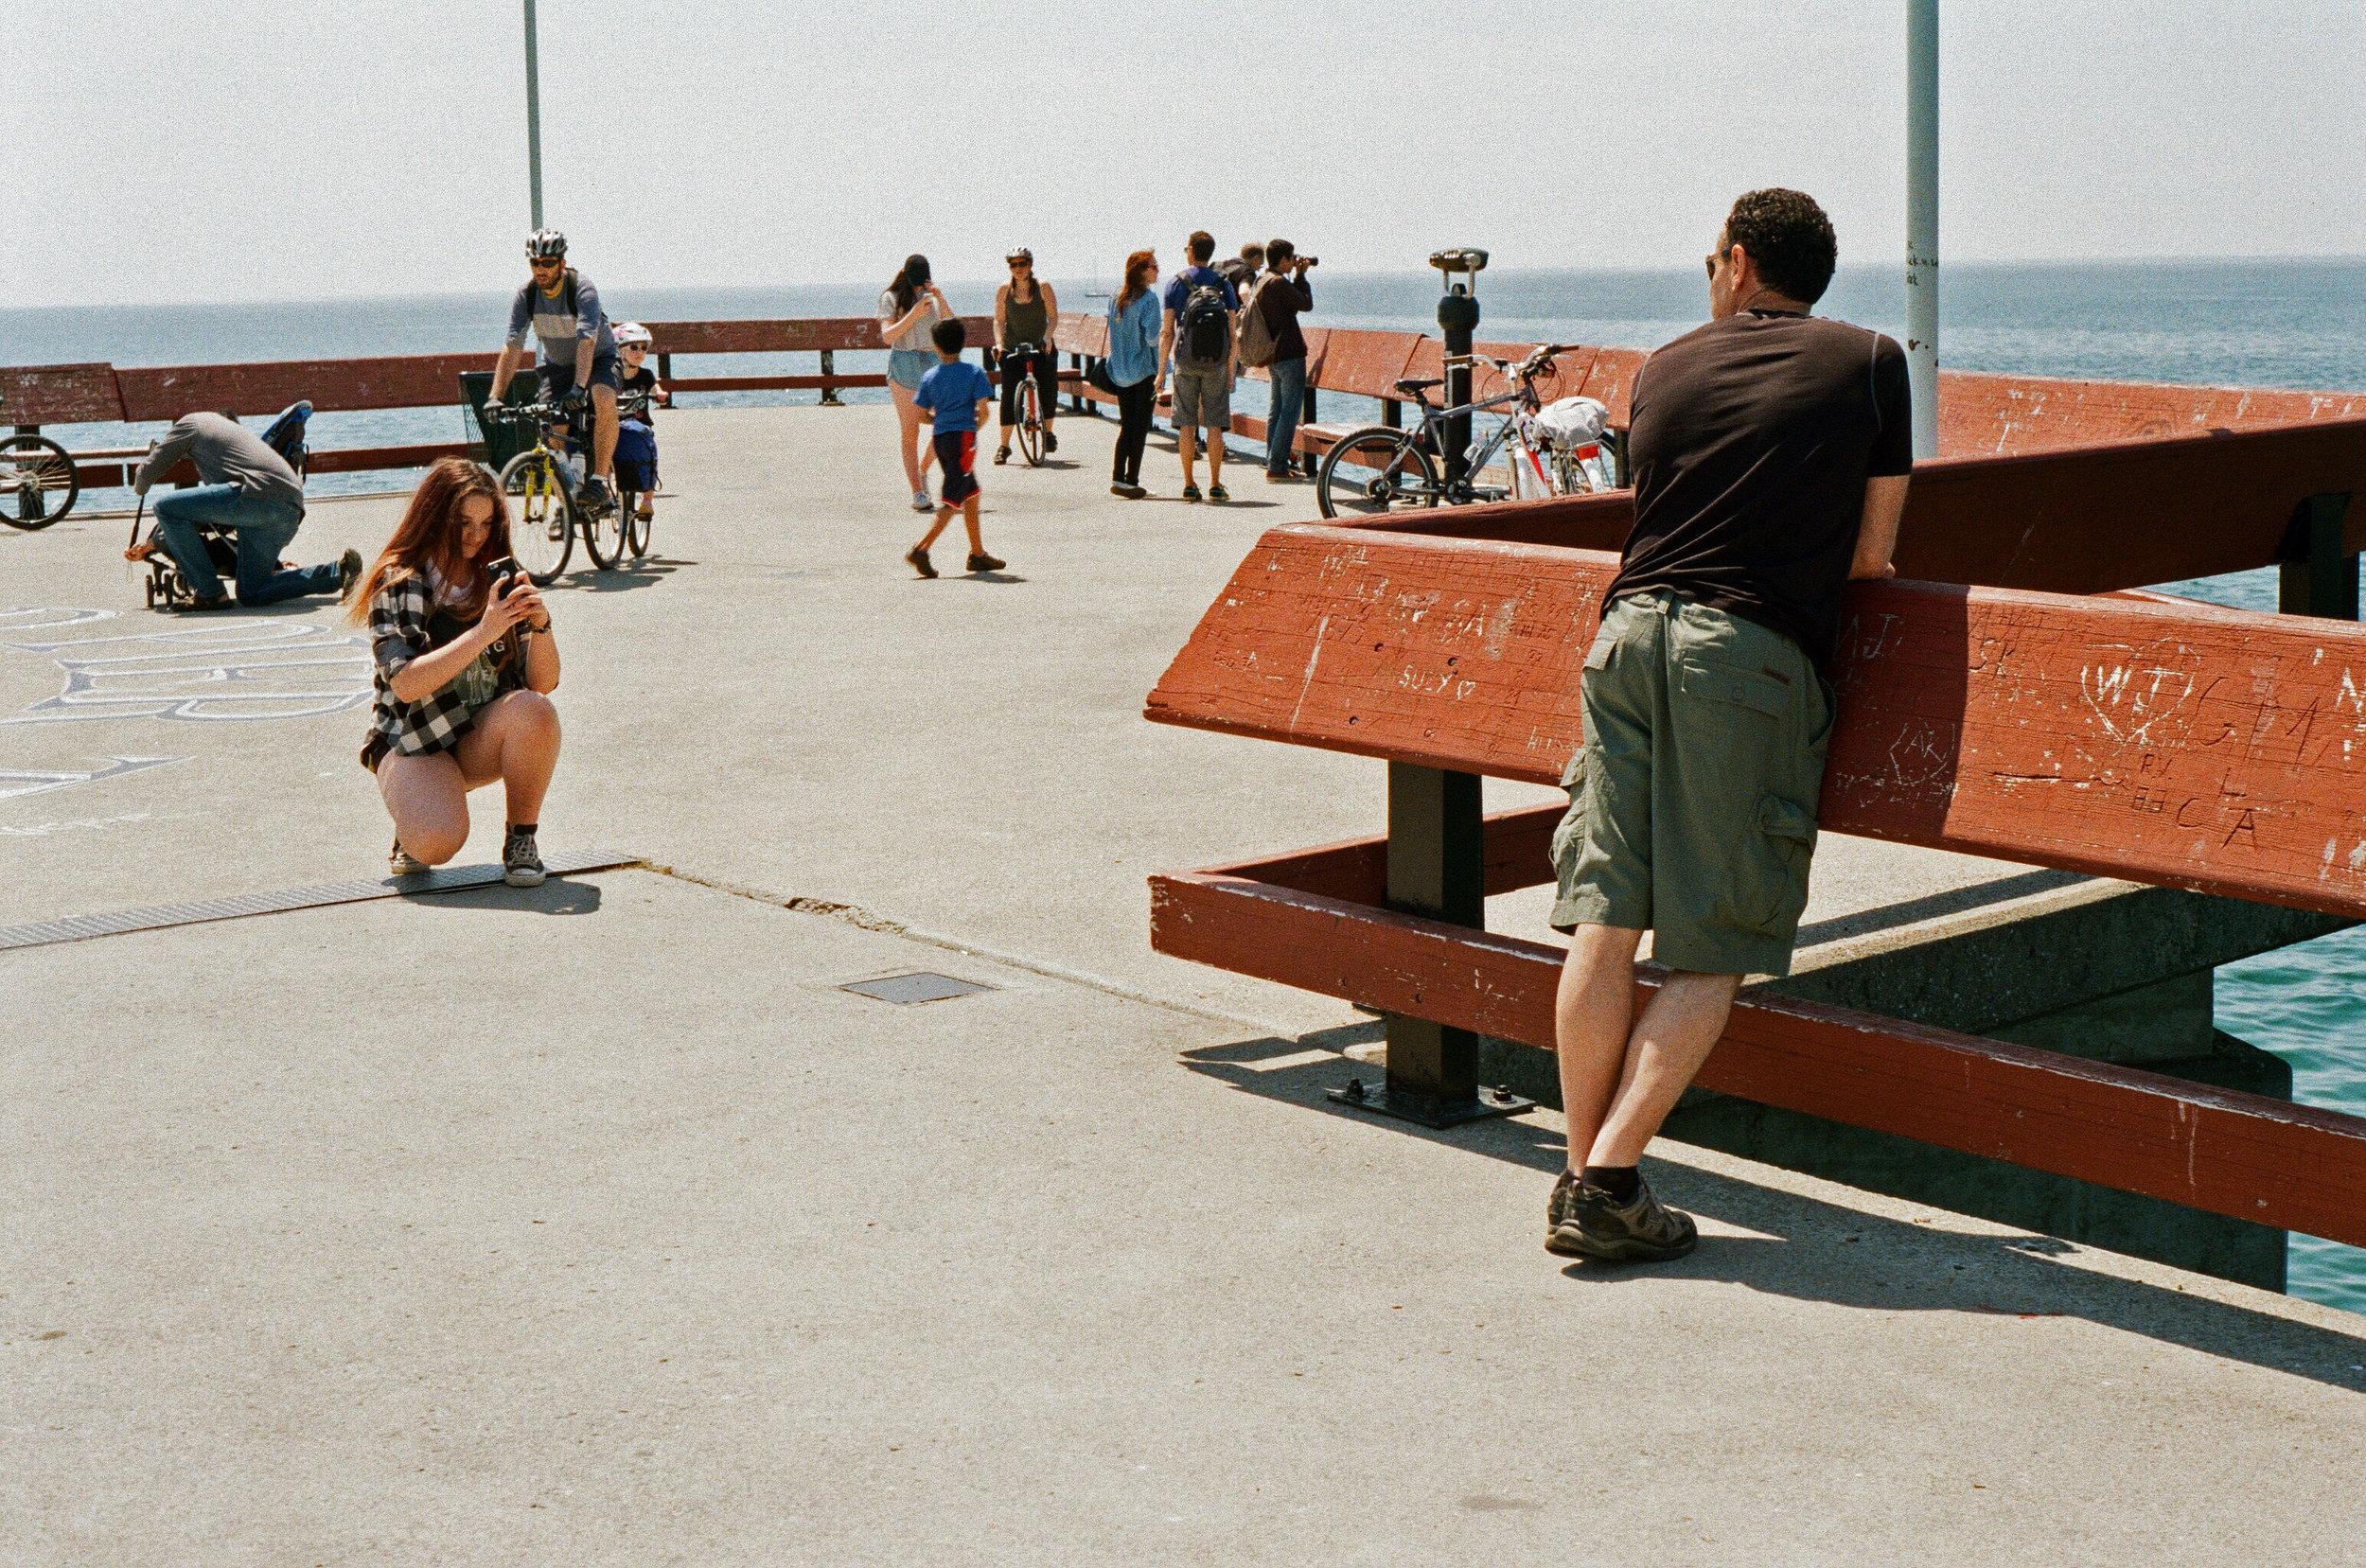 Dock - Pose.jpg